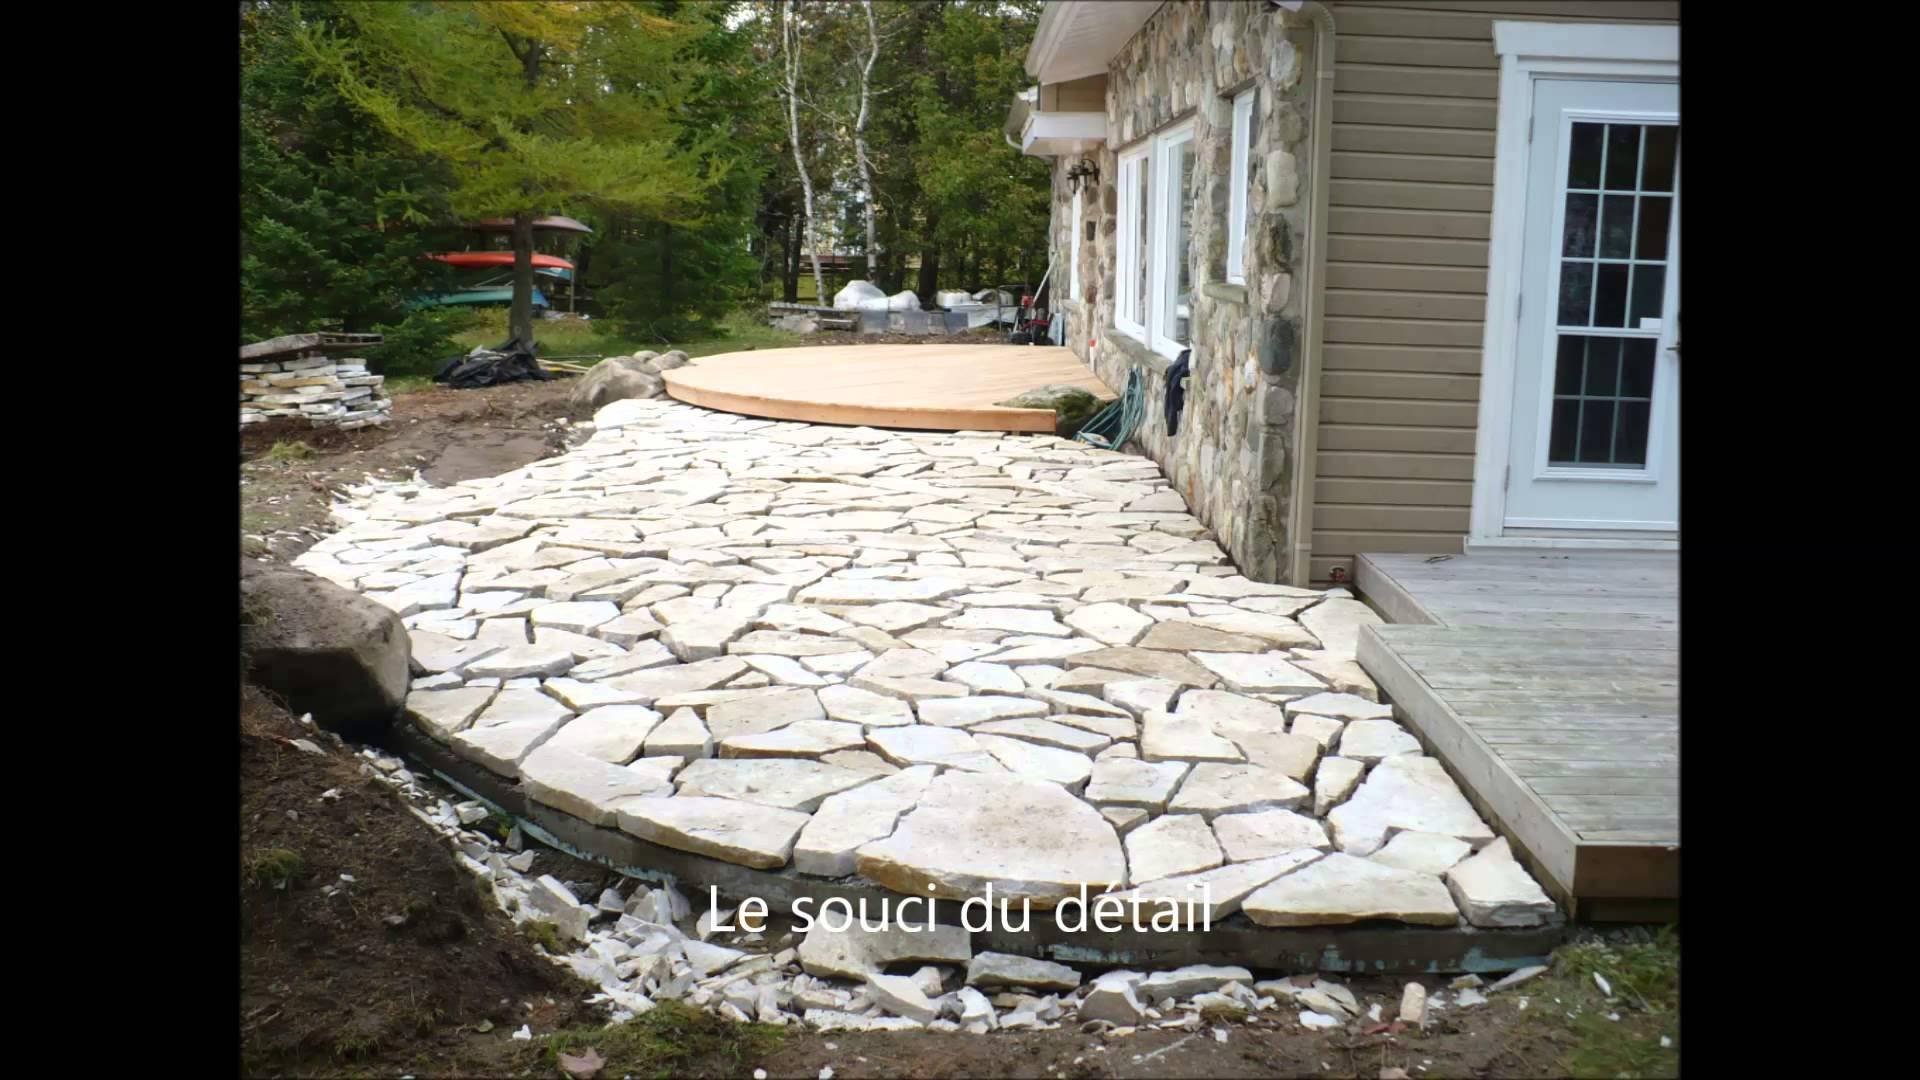 Terrasse en pierre naturelle pose nos conseils - Terrasse en pierre naturelle pose ...